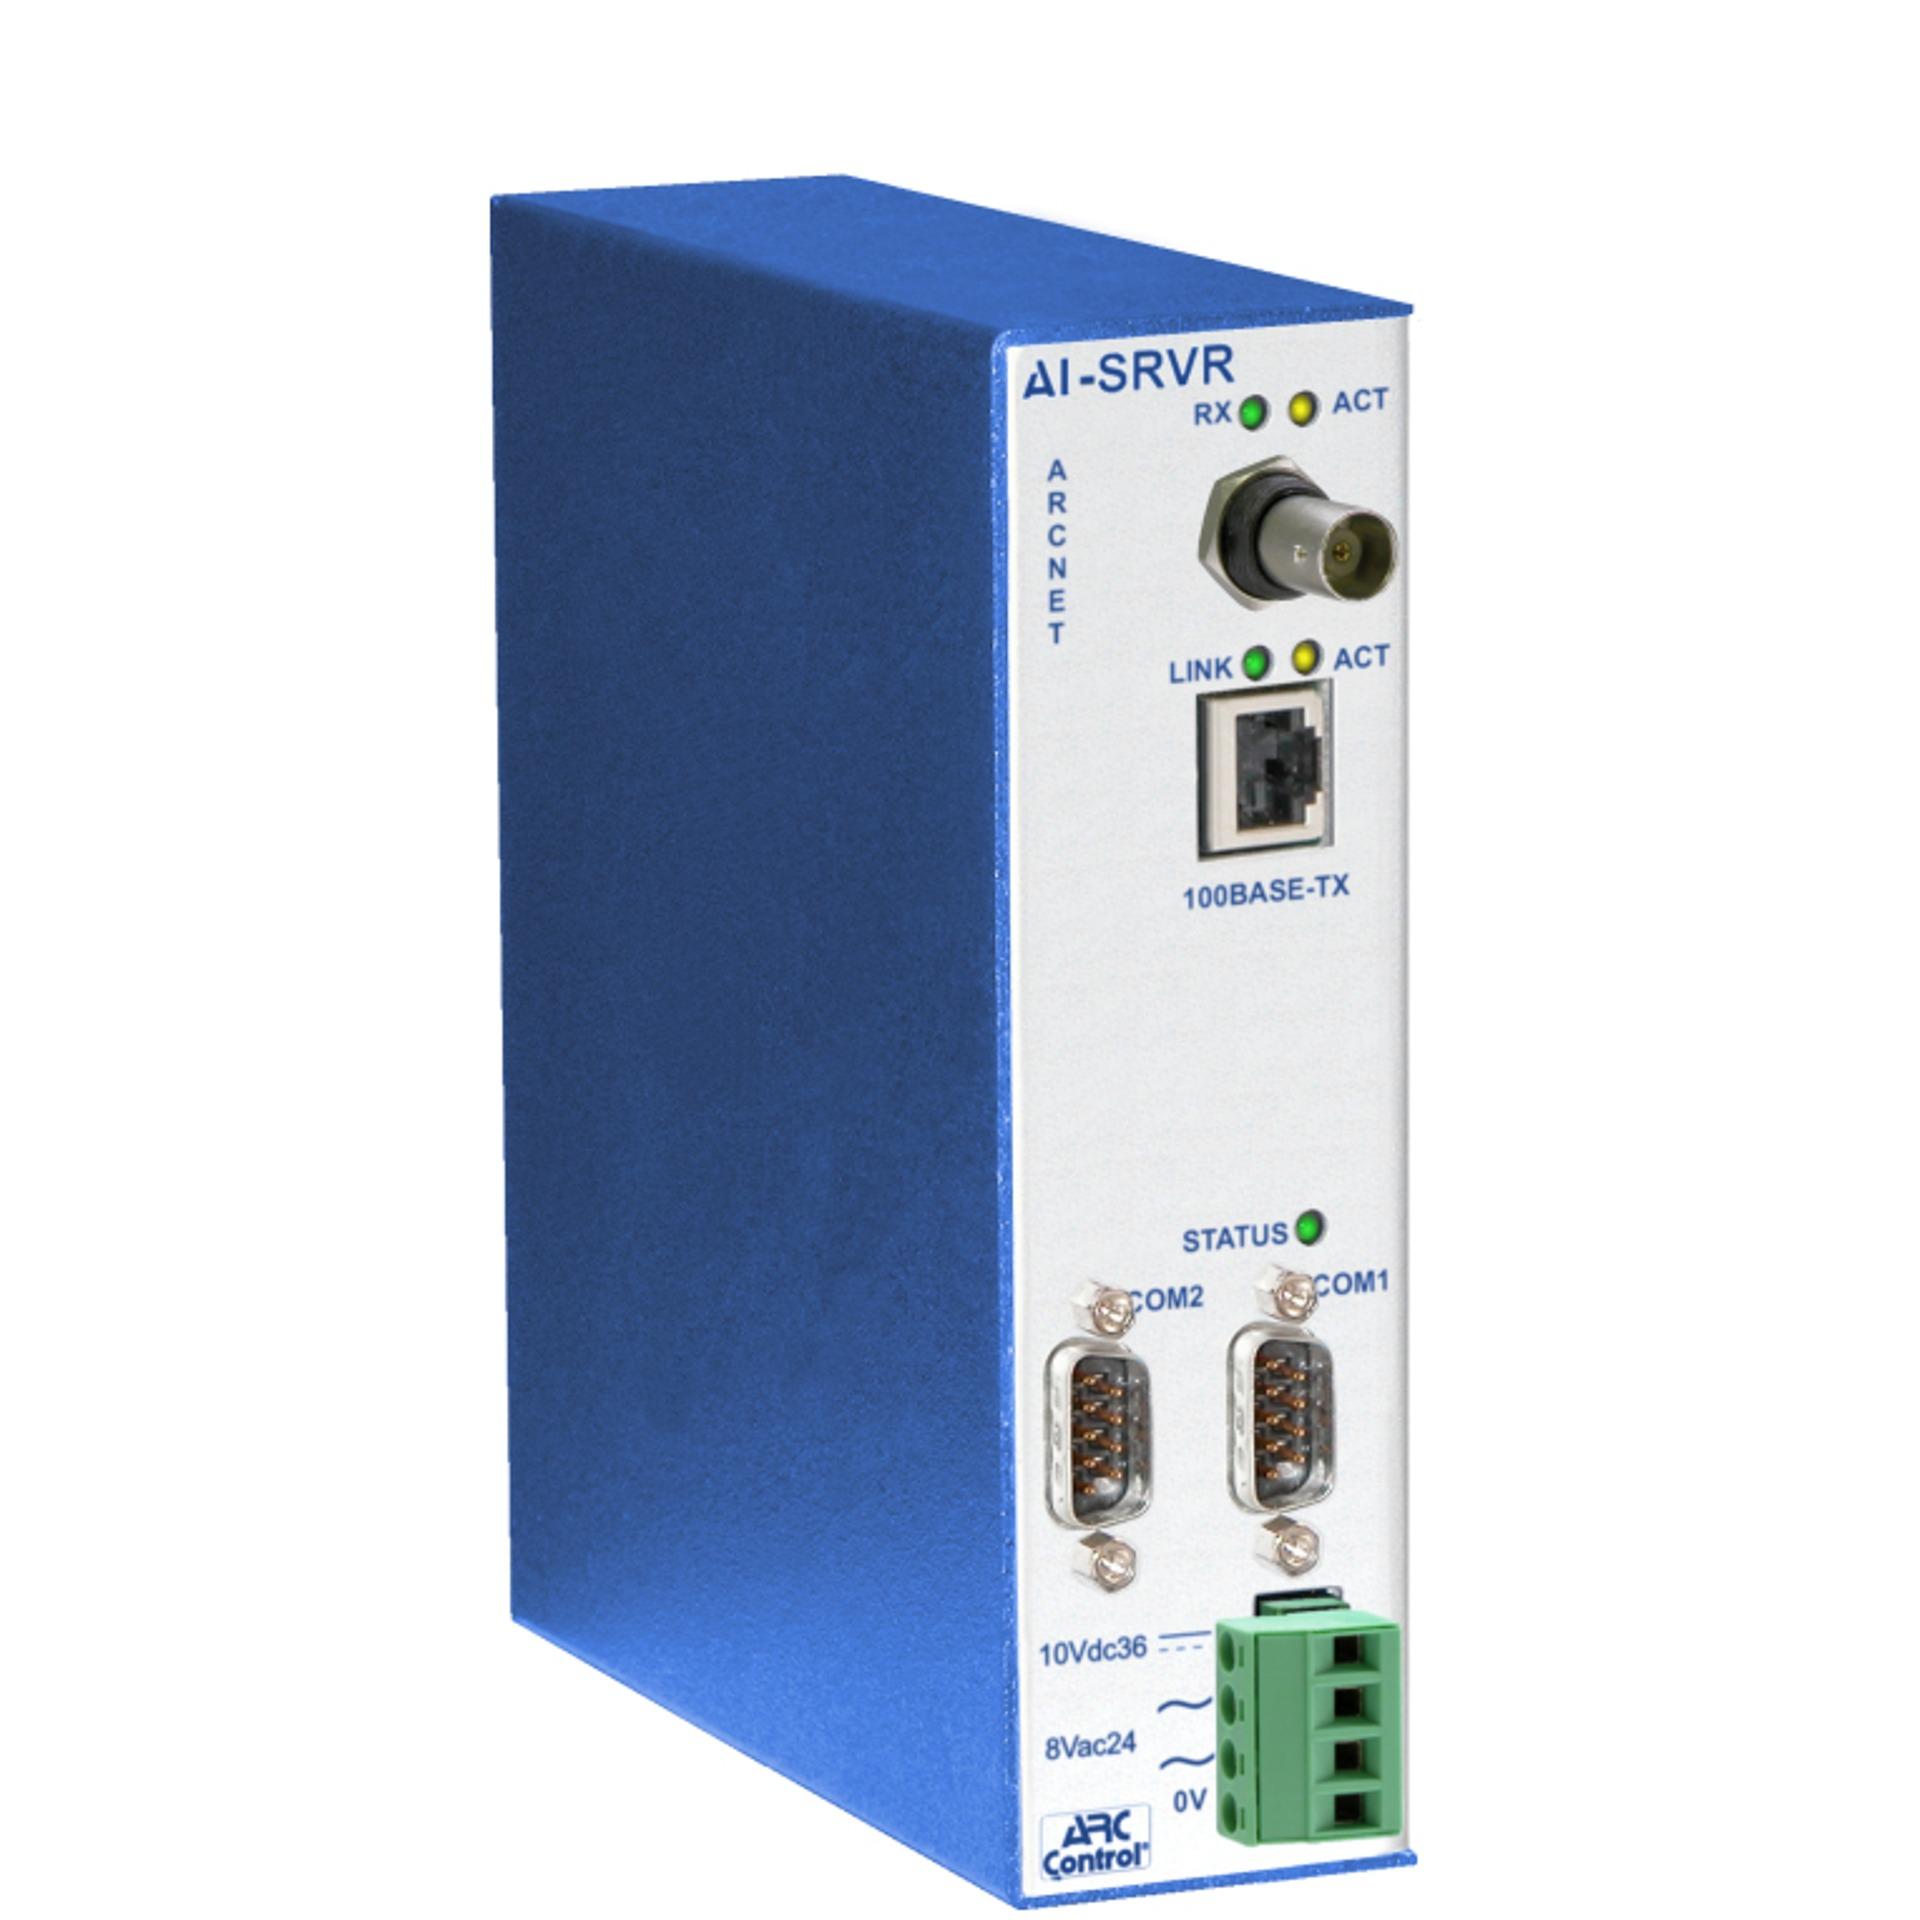 AI-SRVR Serie - ARCnet Server von CControls - BellEquip